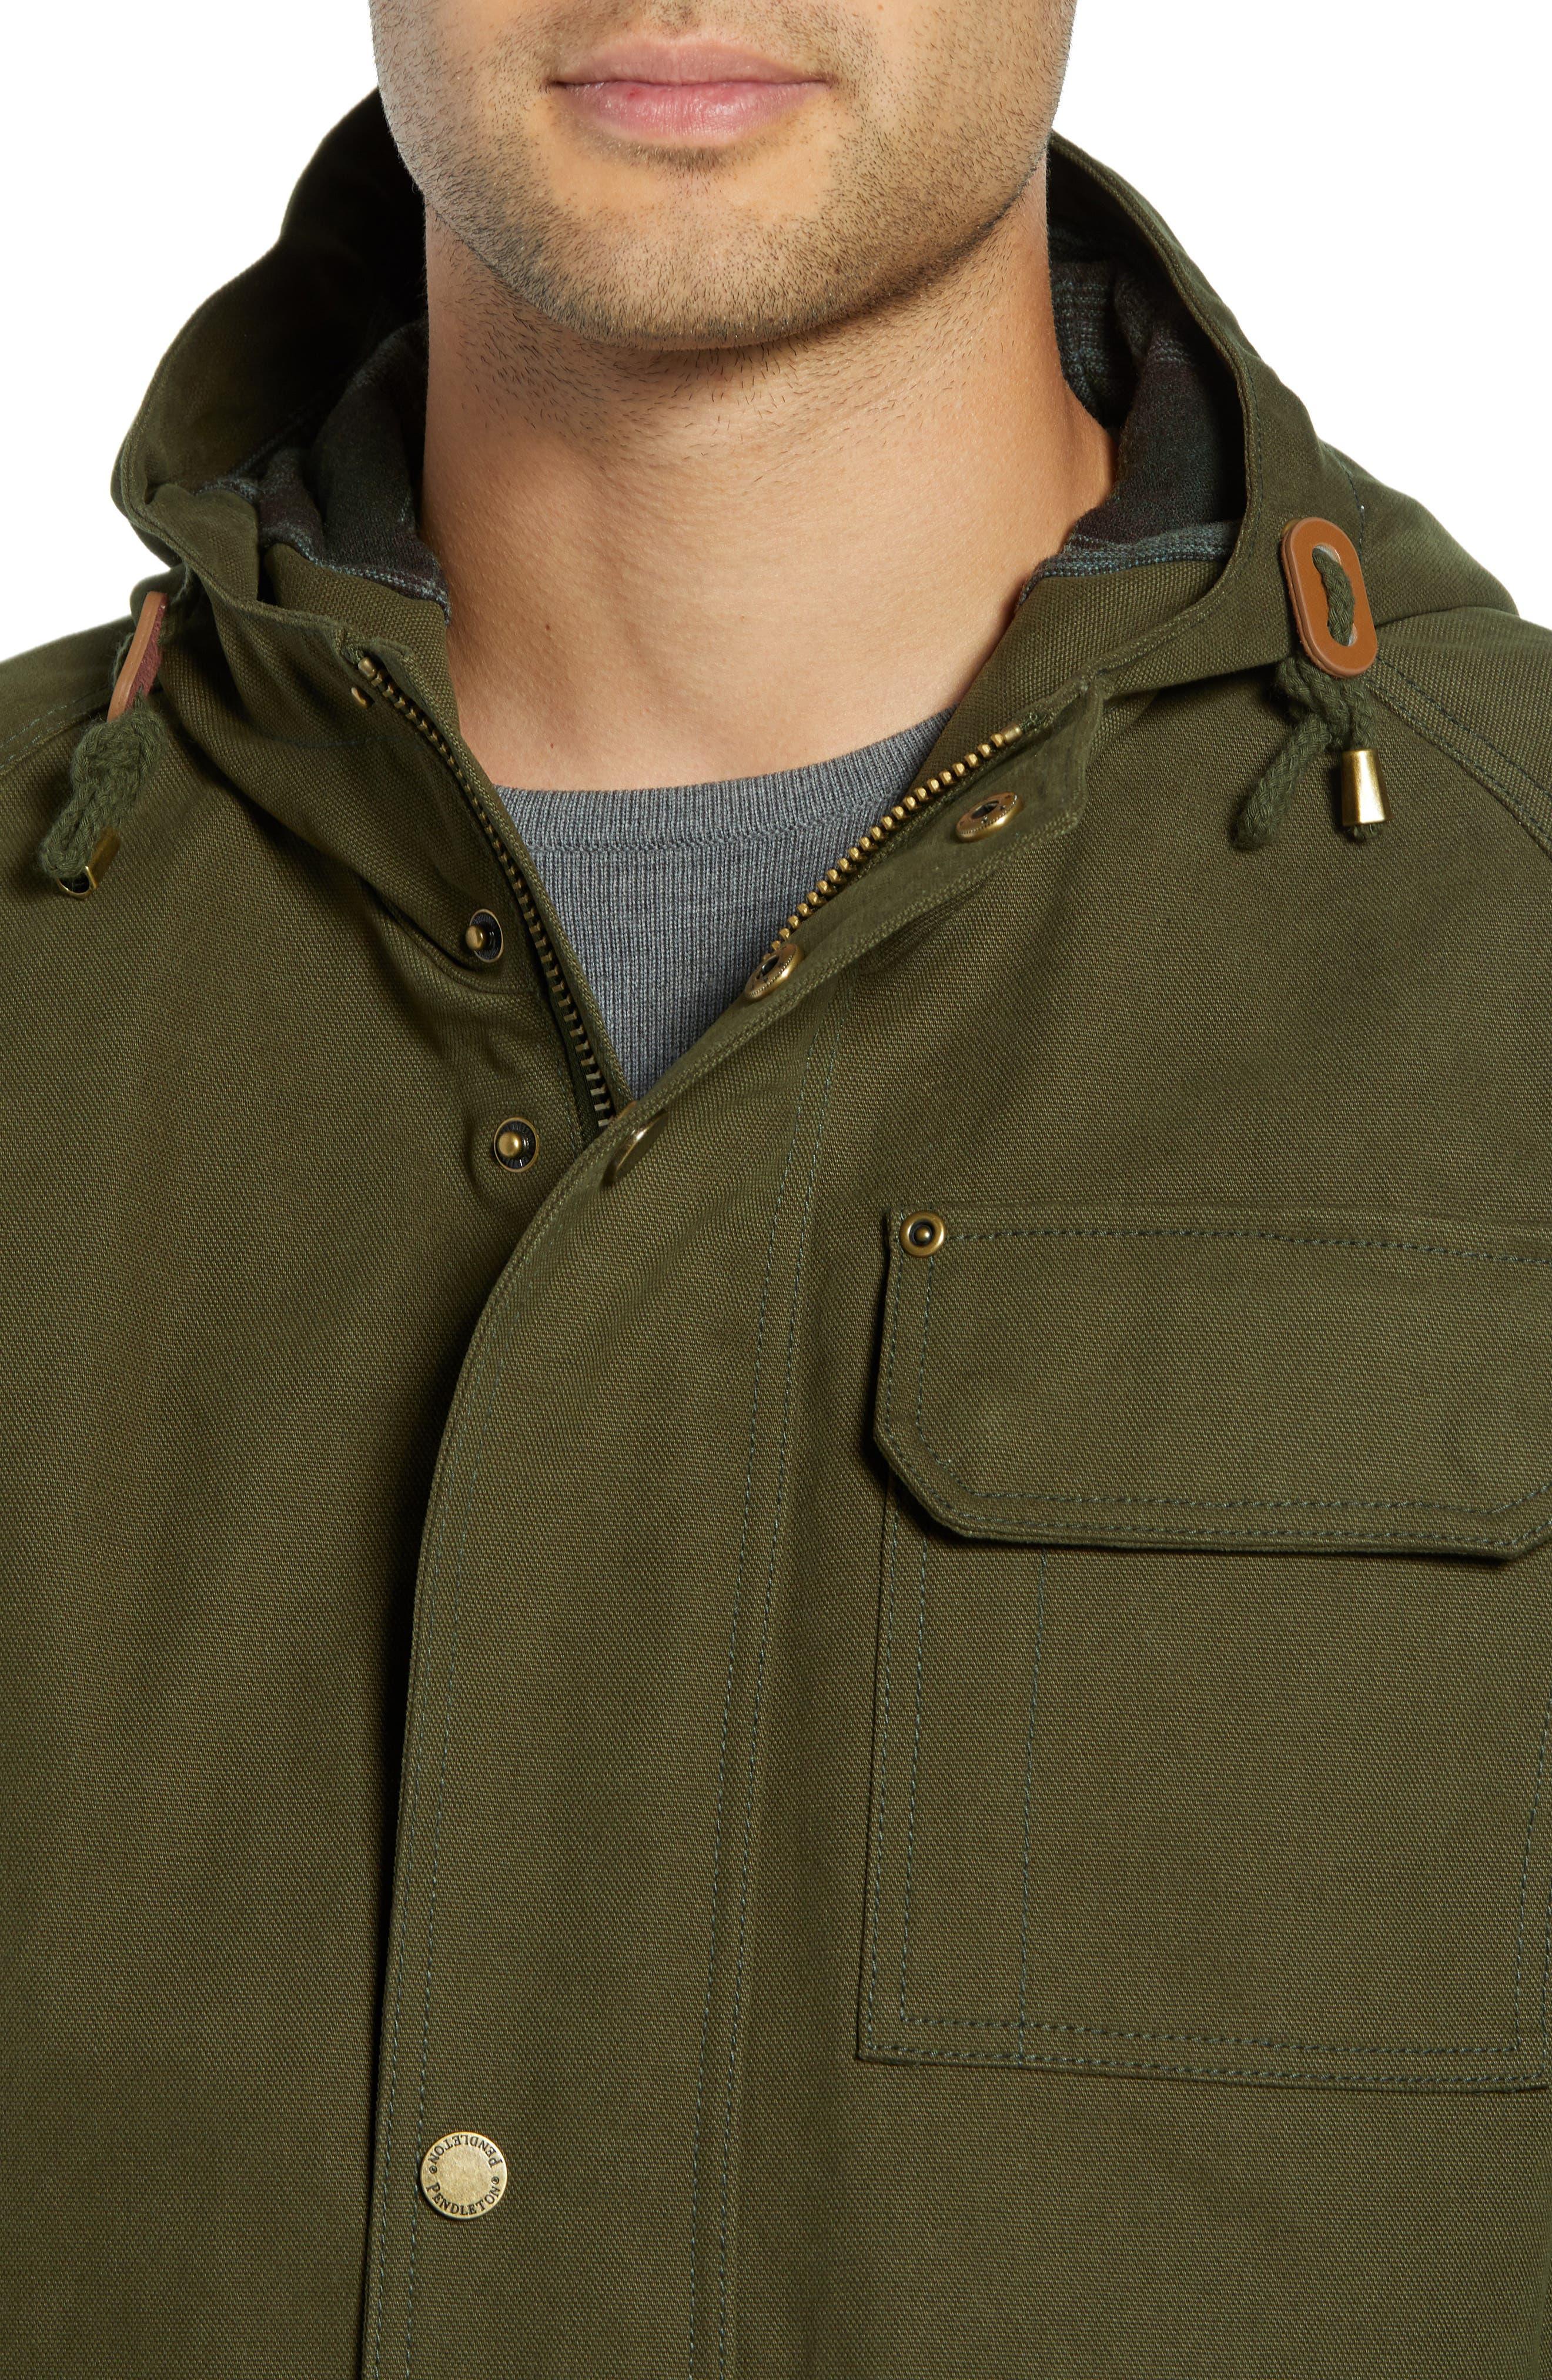 Dry Goods Cascade Raincoat,                             Alternate thumbnail 4, color,                             OLIVE